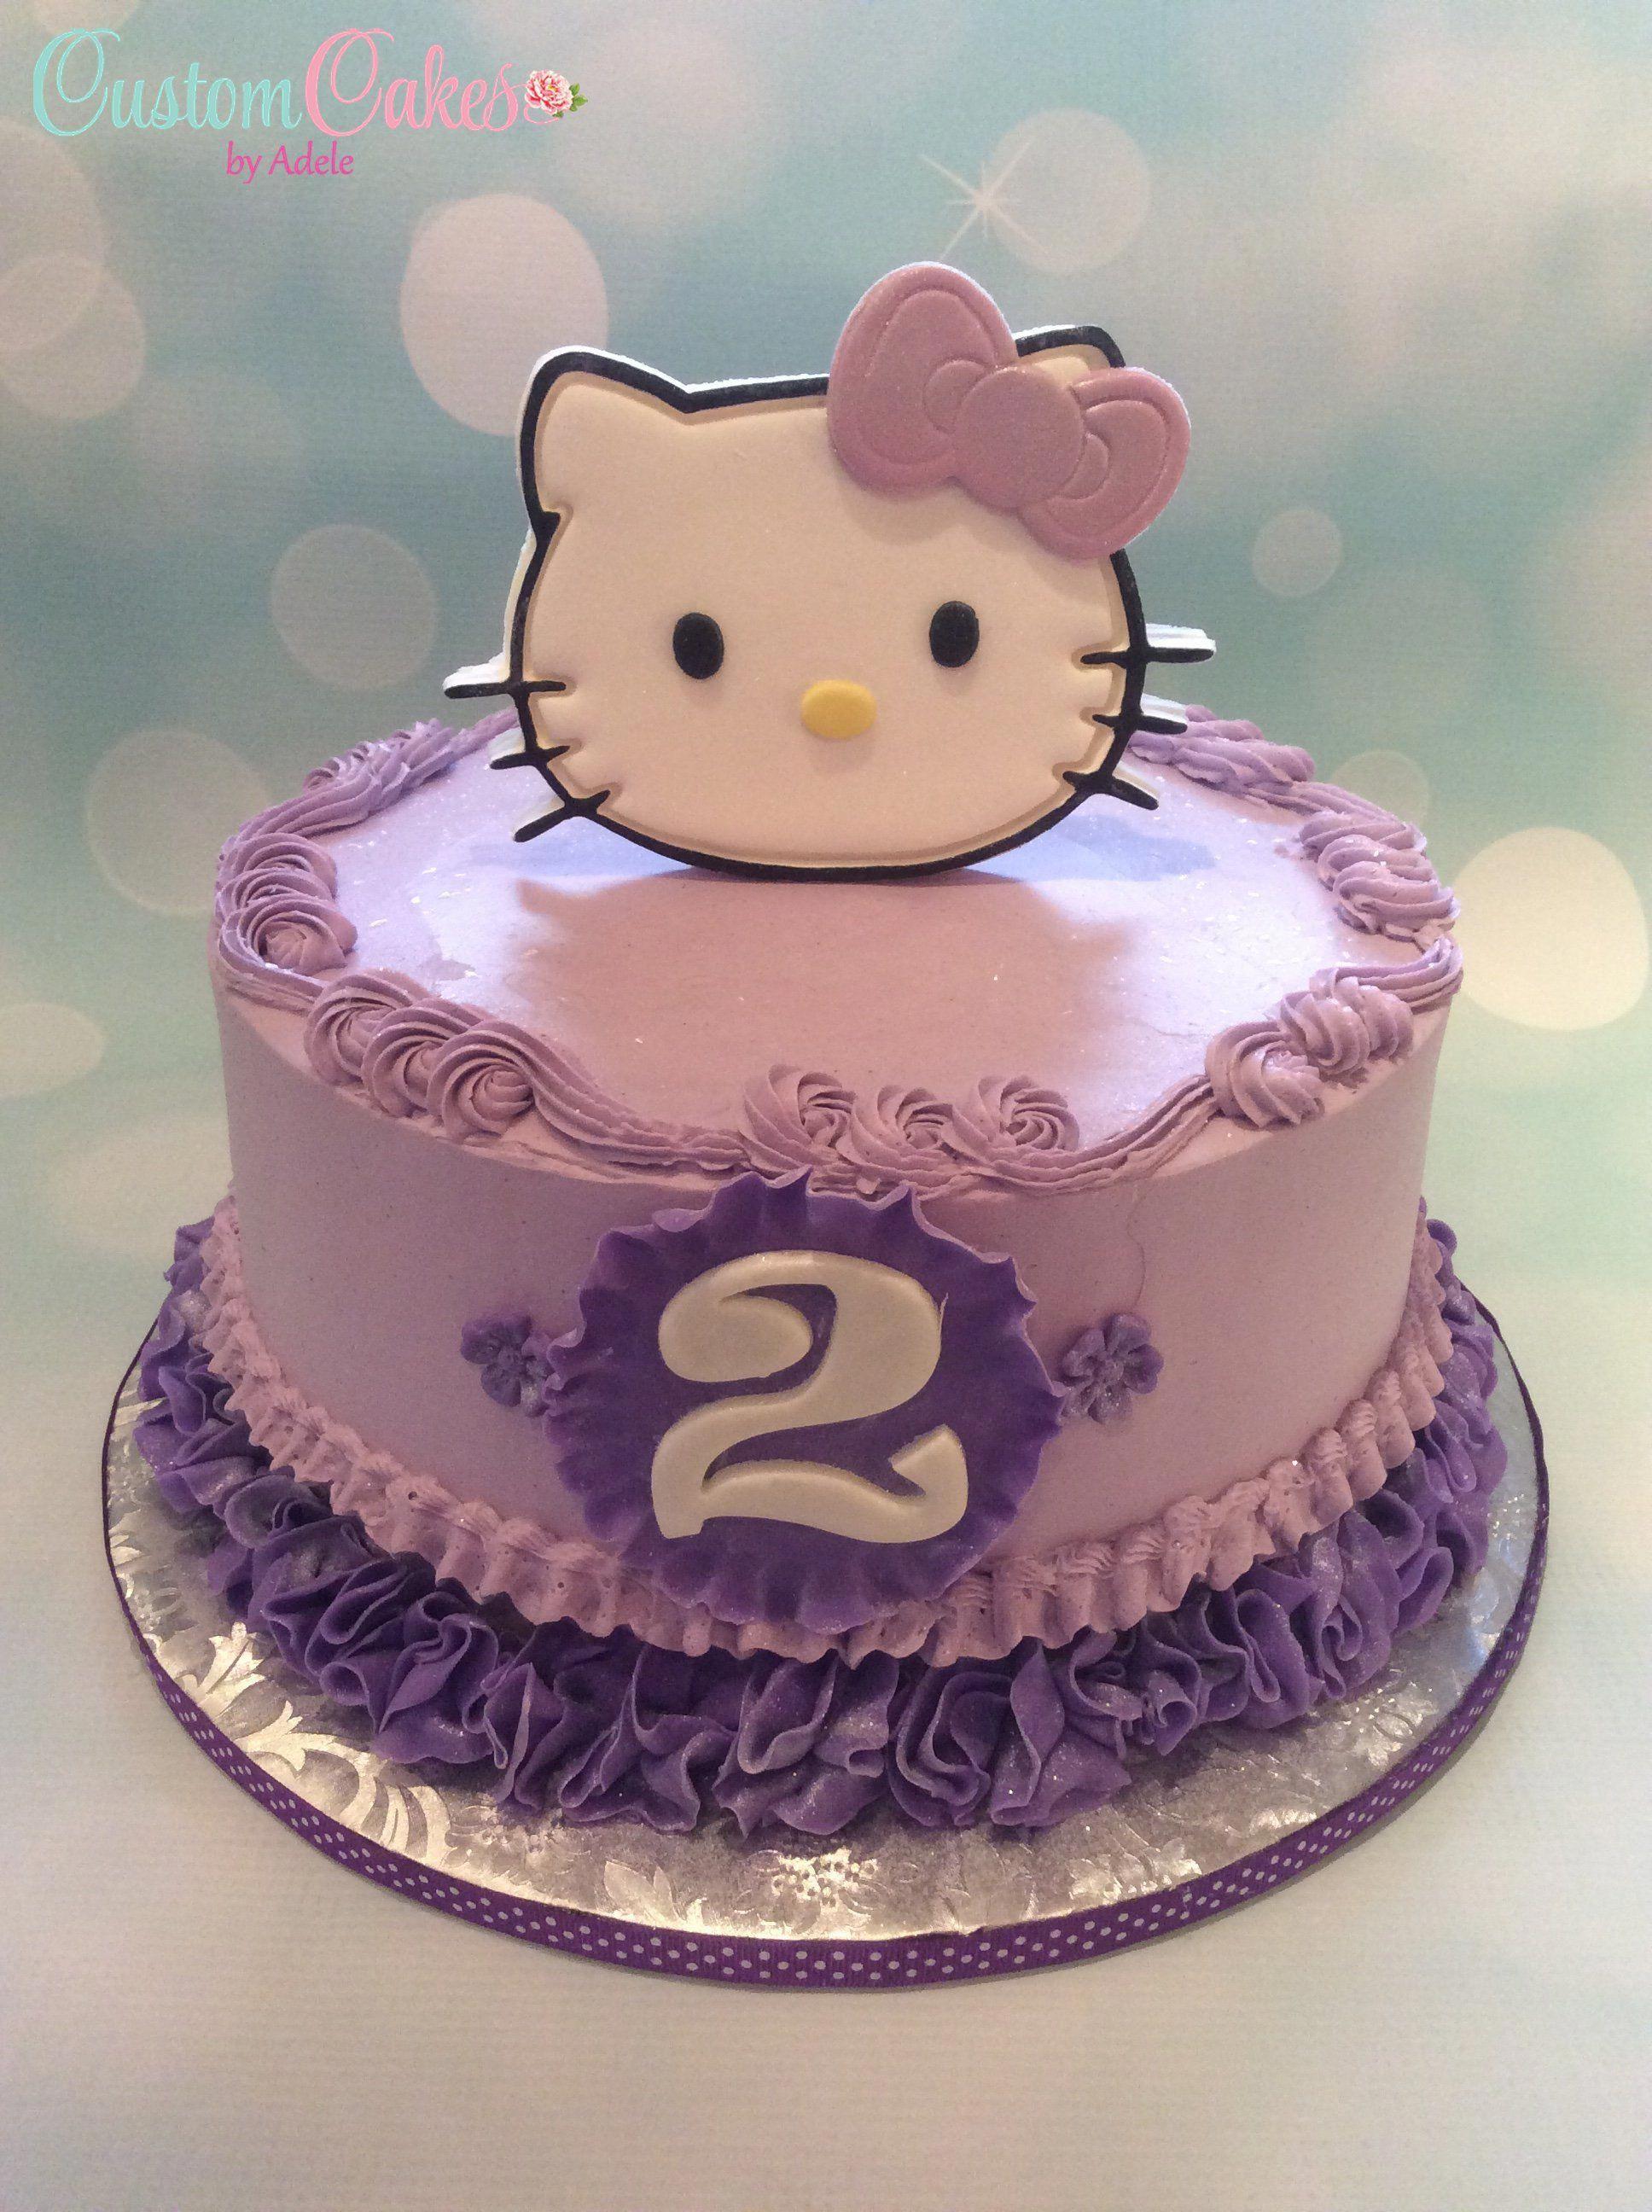 Hello Kitty Cake In Purple Birthdaycakesforcats Hello Kitty Birthday Cake 2nd Birthday Cake Girl Birthday Cake For Cat